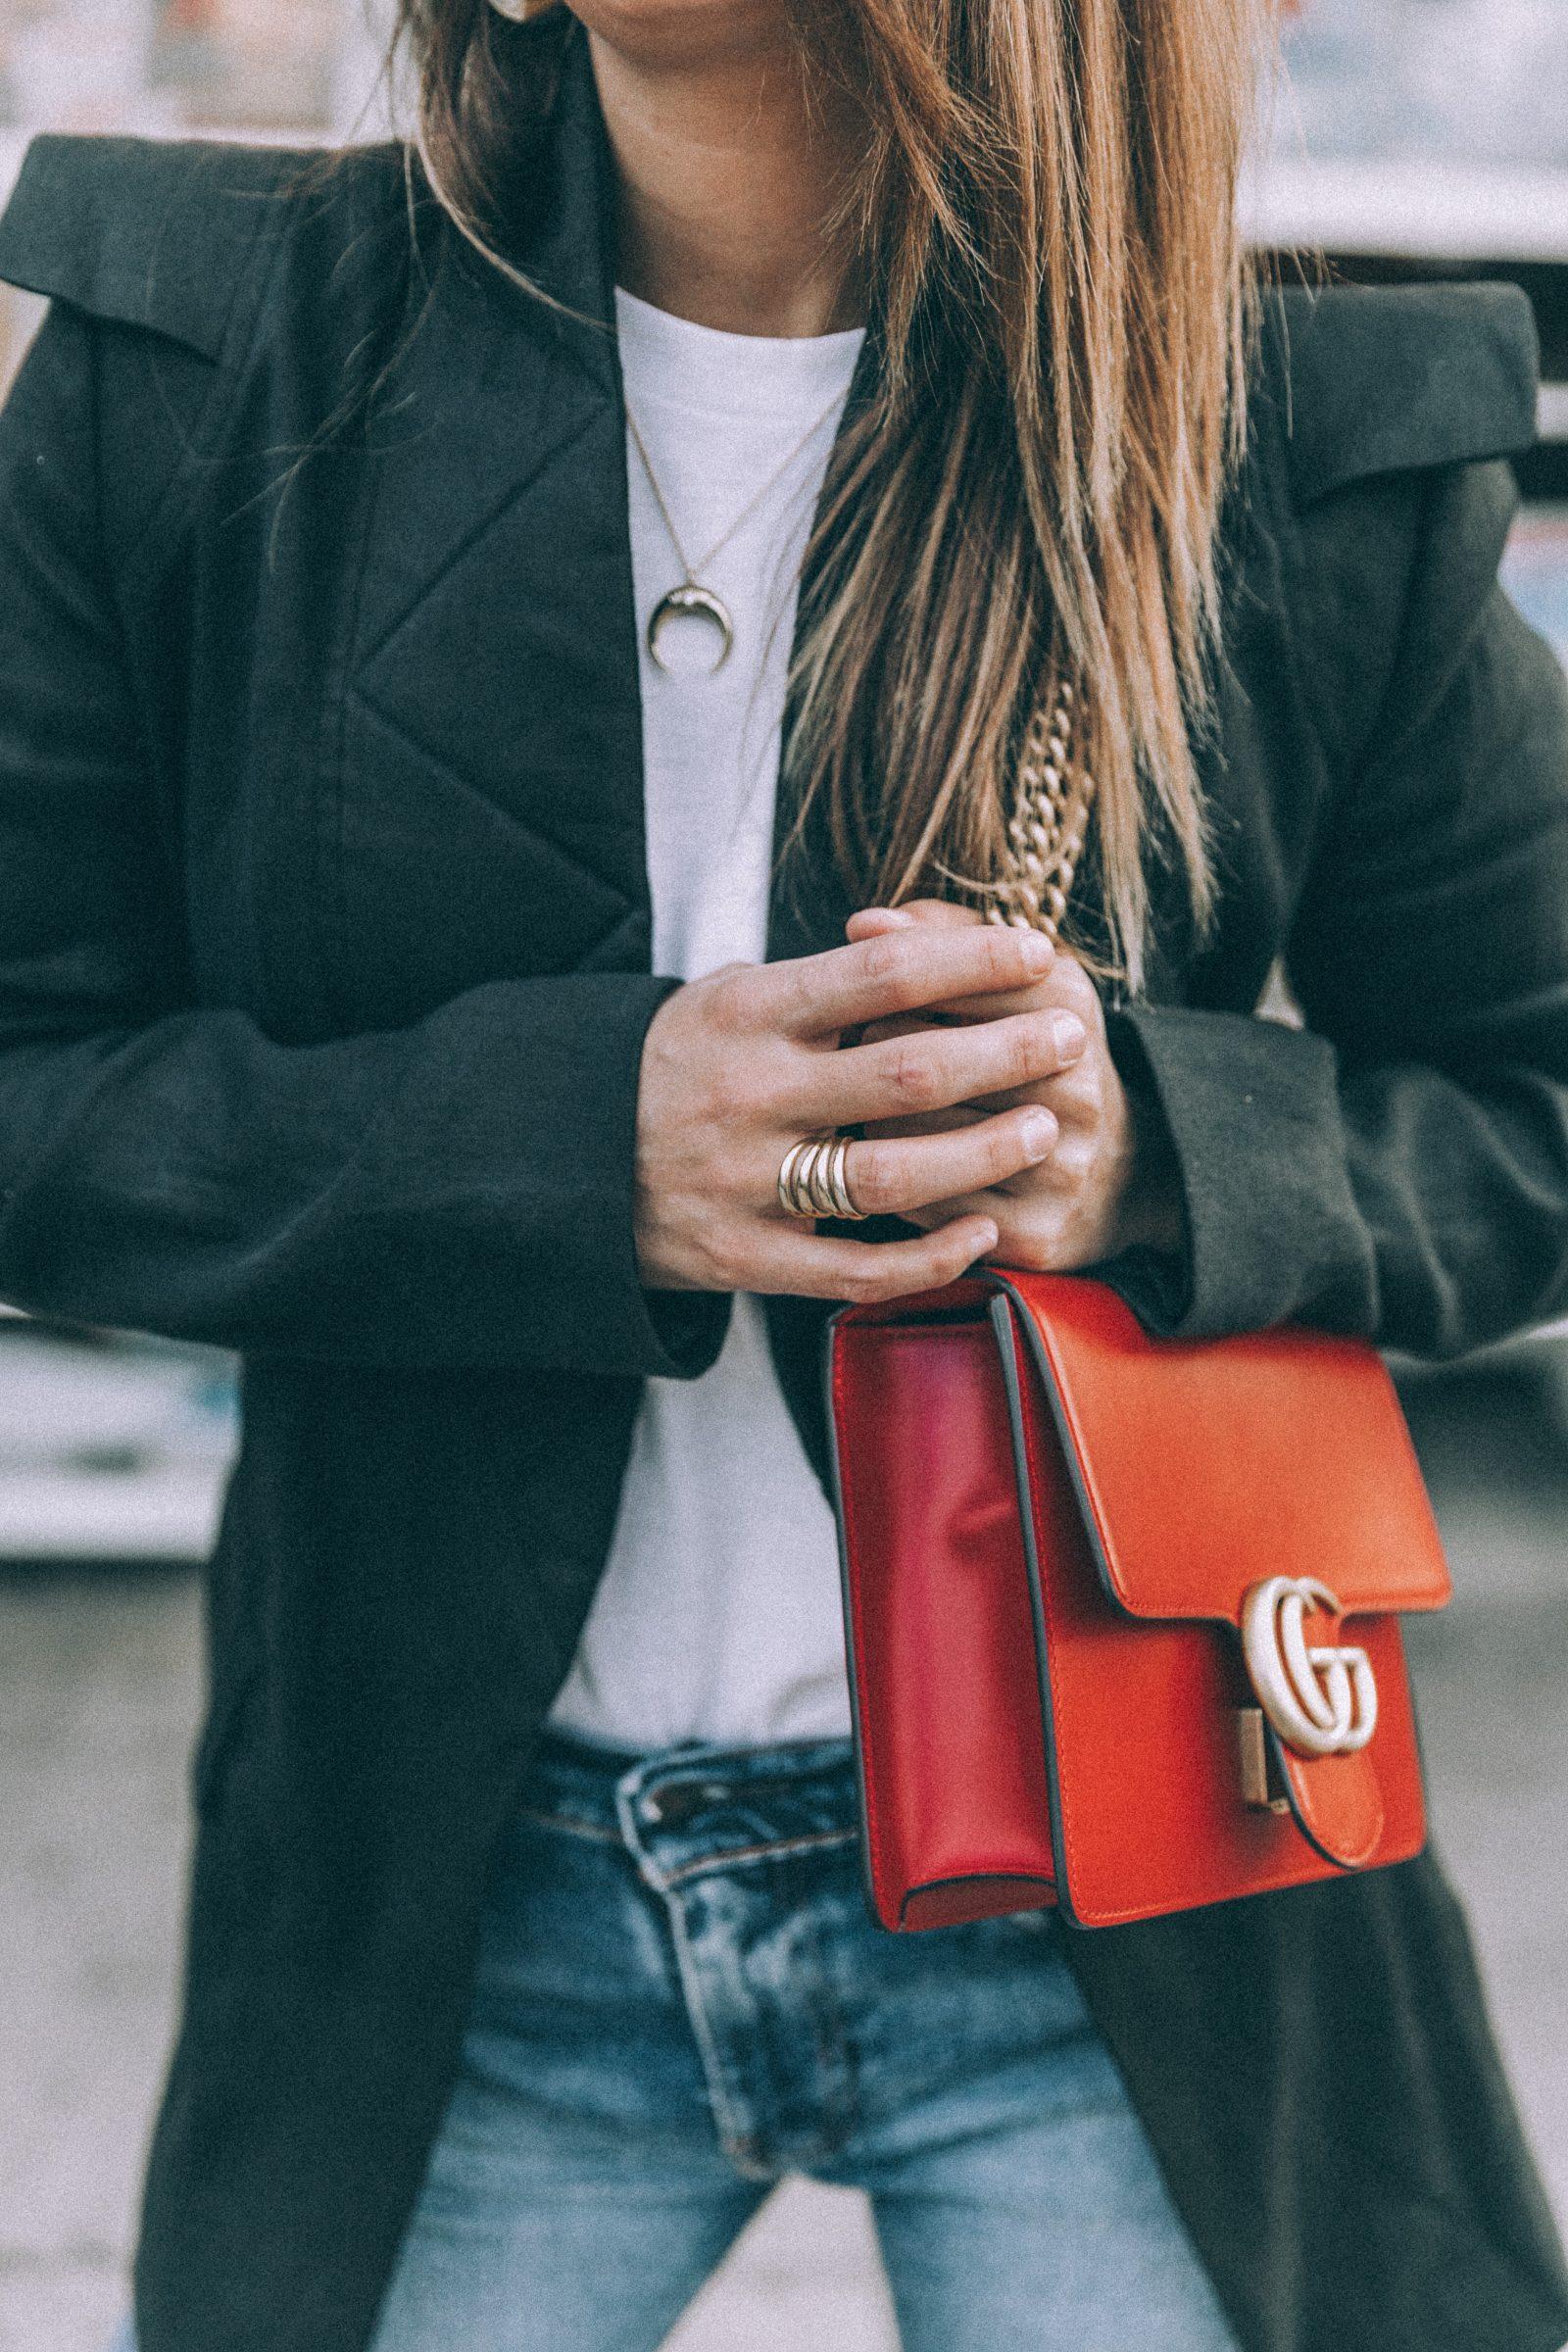 red_bag-snake_boots-gucci-levis-jeans-denim-iro_paris-black_blazer-los_angeles-la-fairfax-outfit-street_style-collage_vintage-31